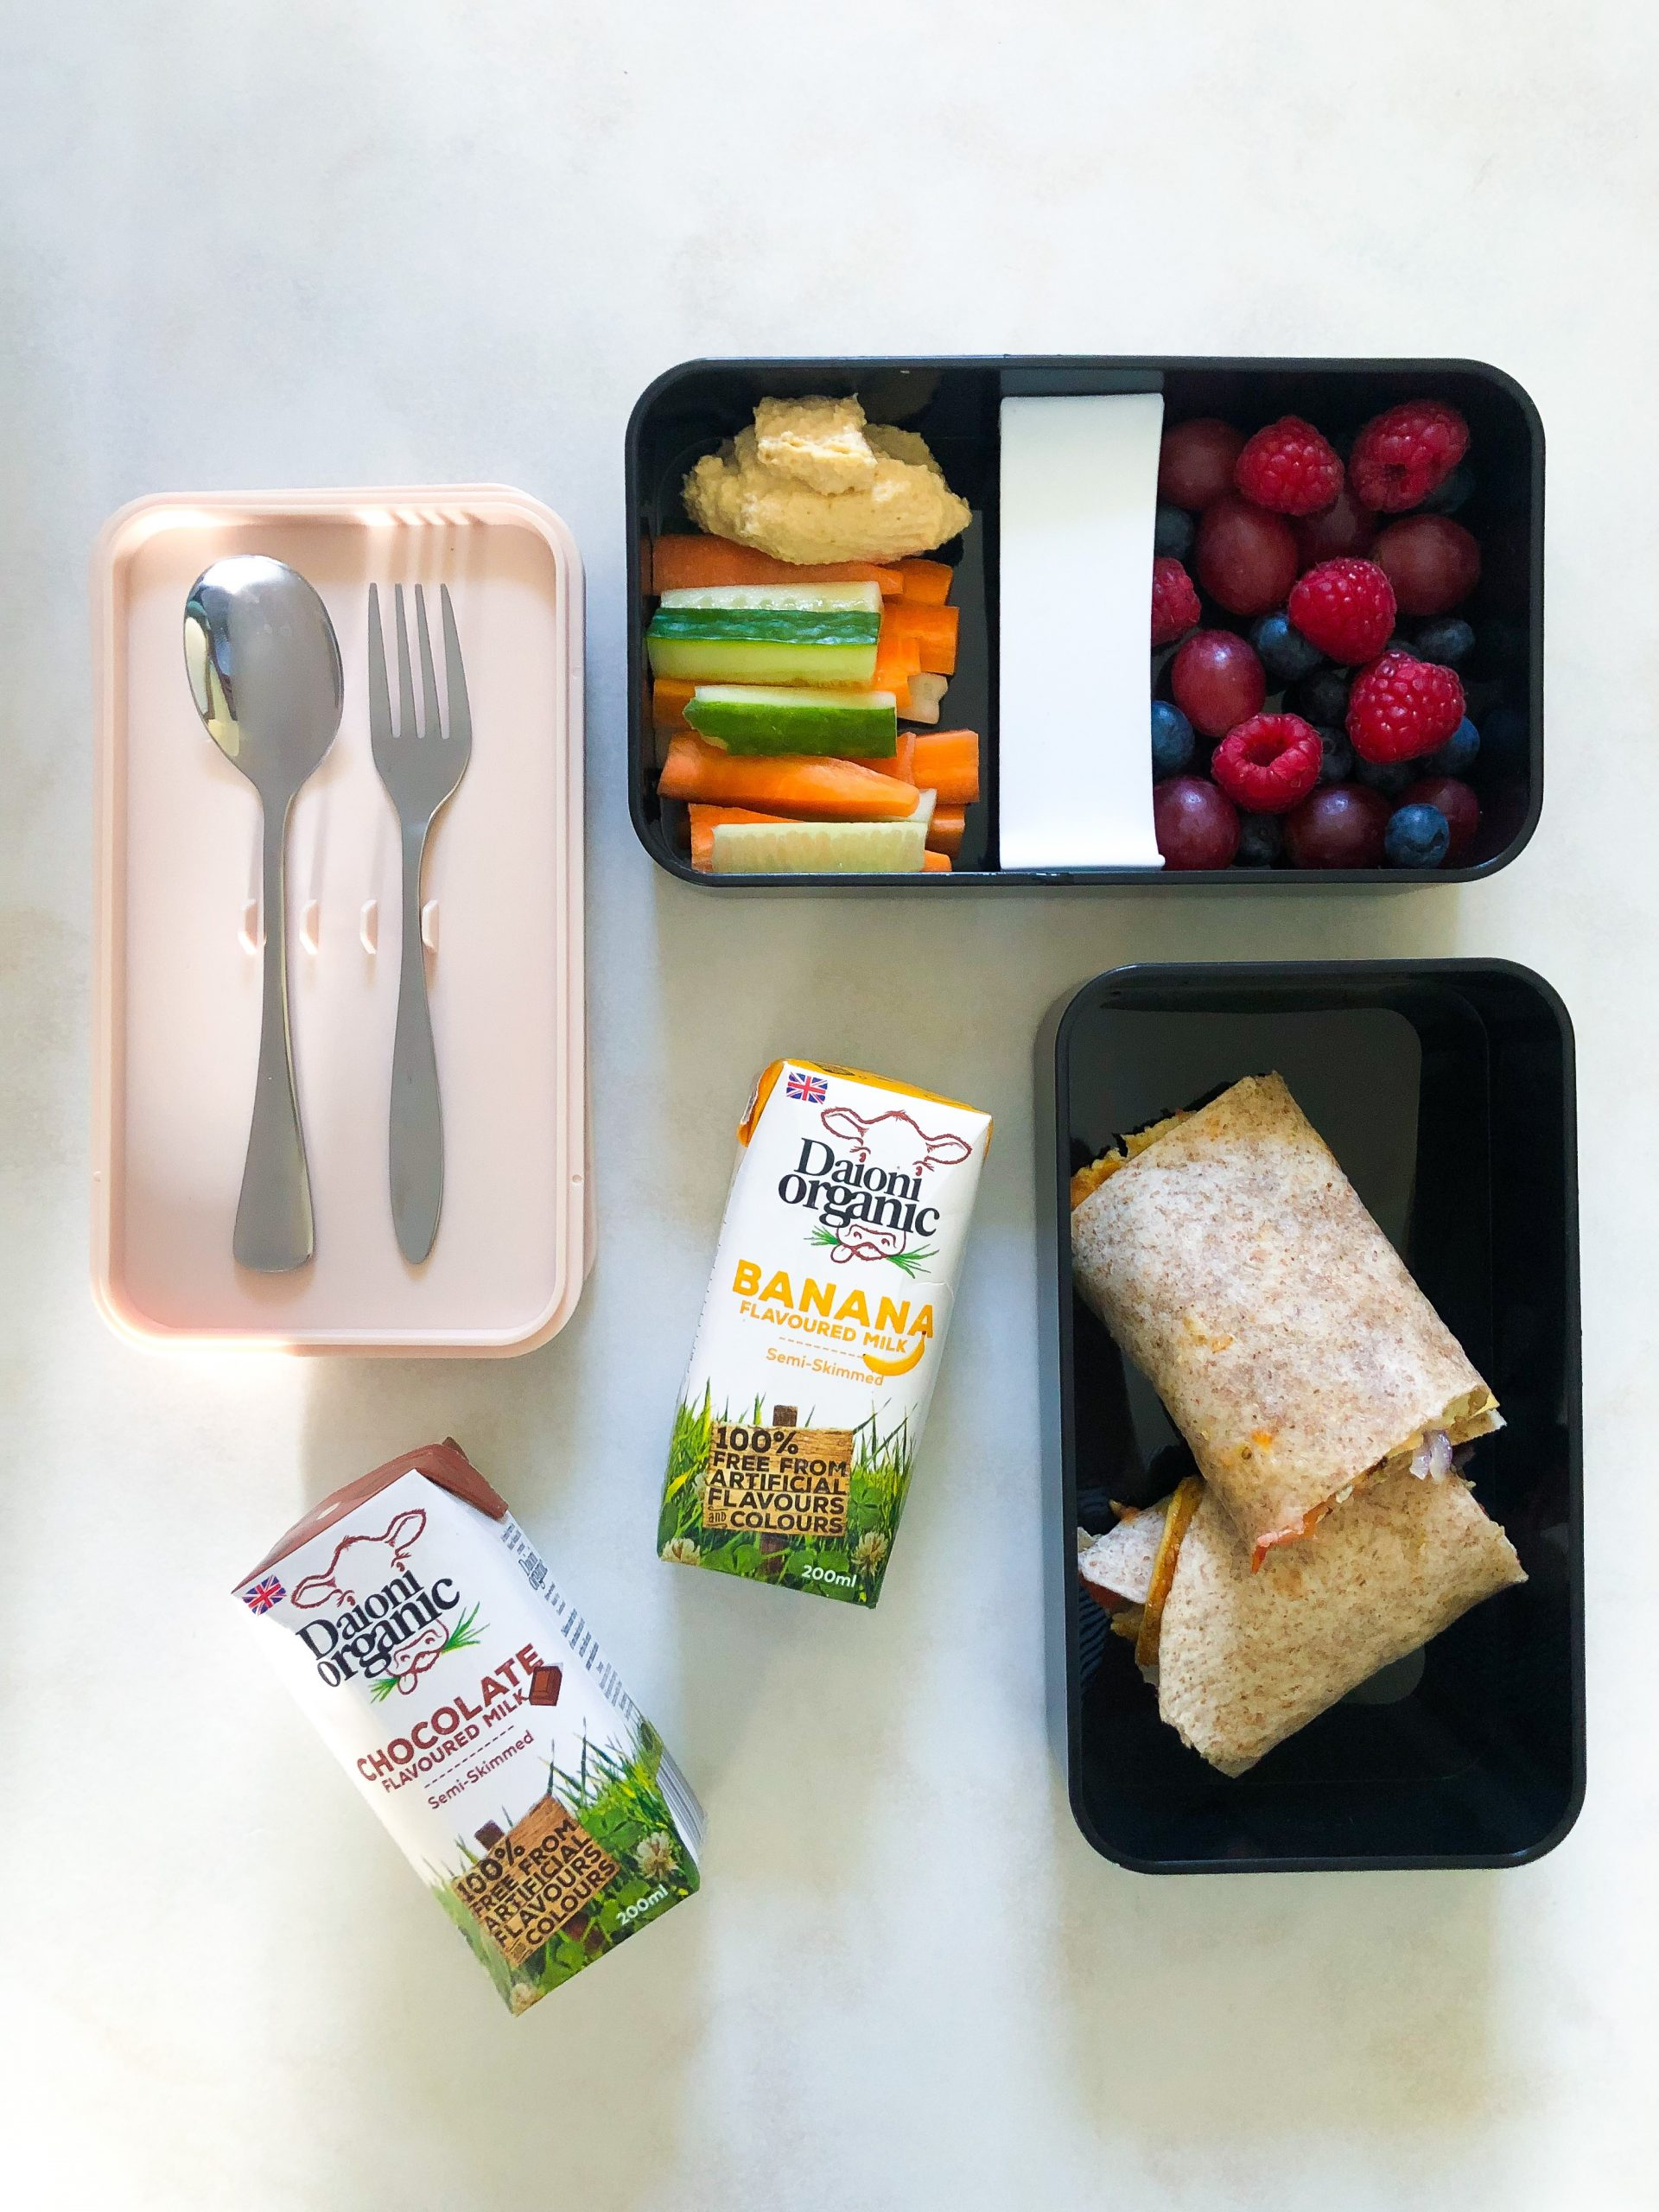 Daioni Organic Tortilla Wrap